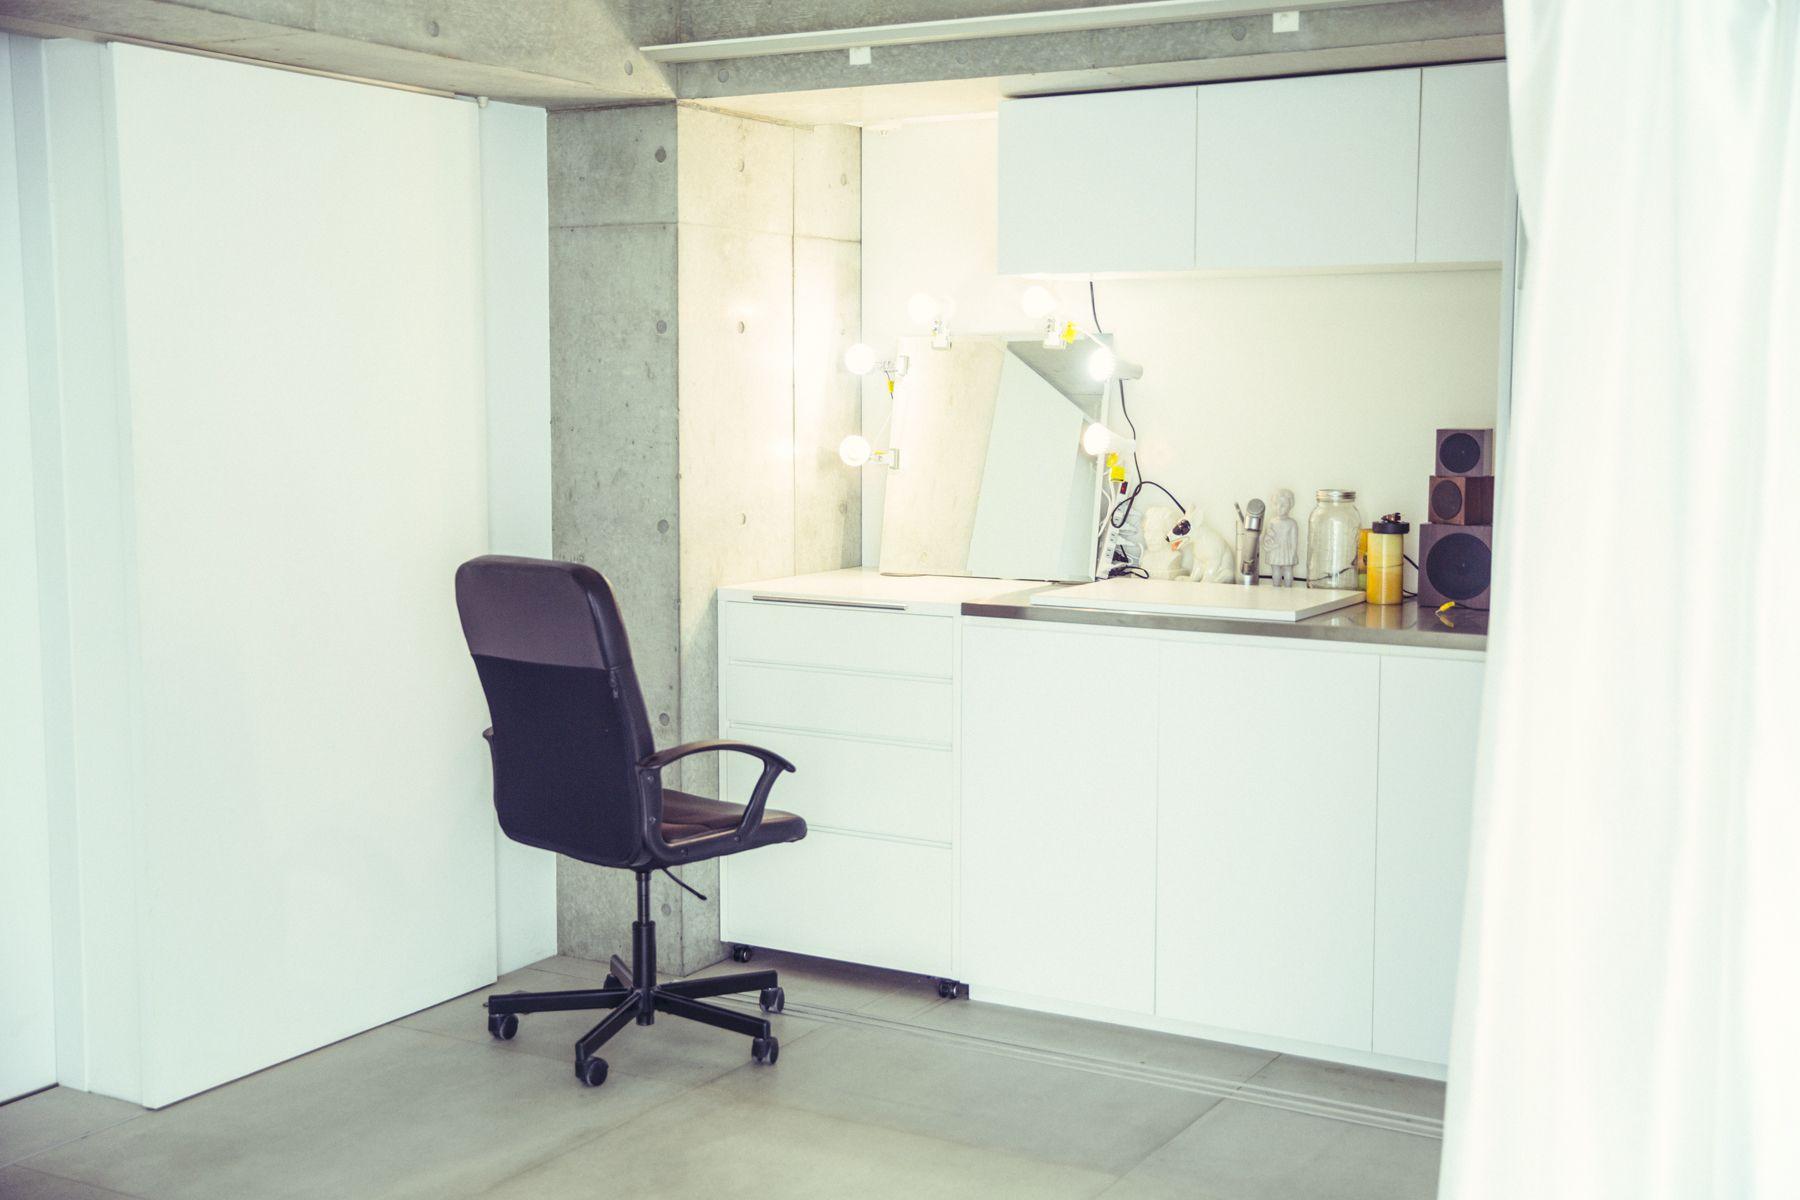 White Room (Pygmy Company) ホワイトルーム4F メイクスペース